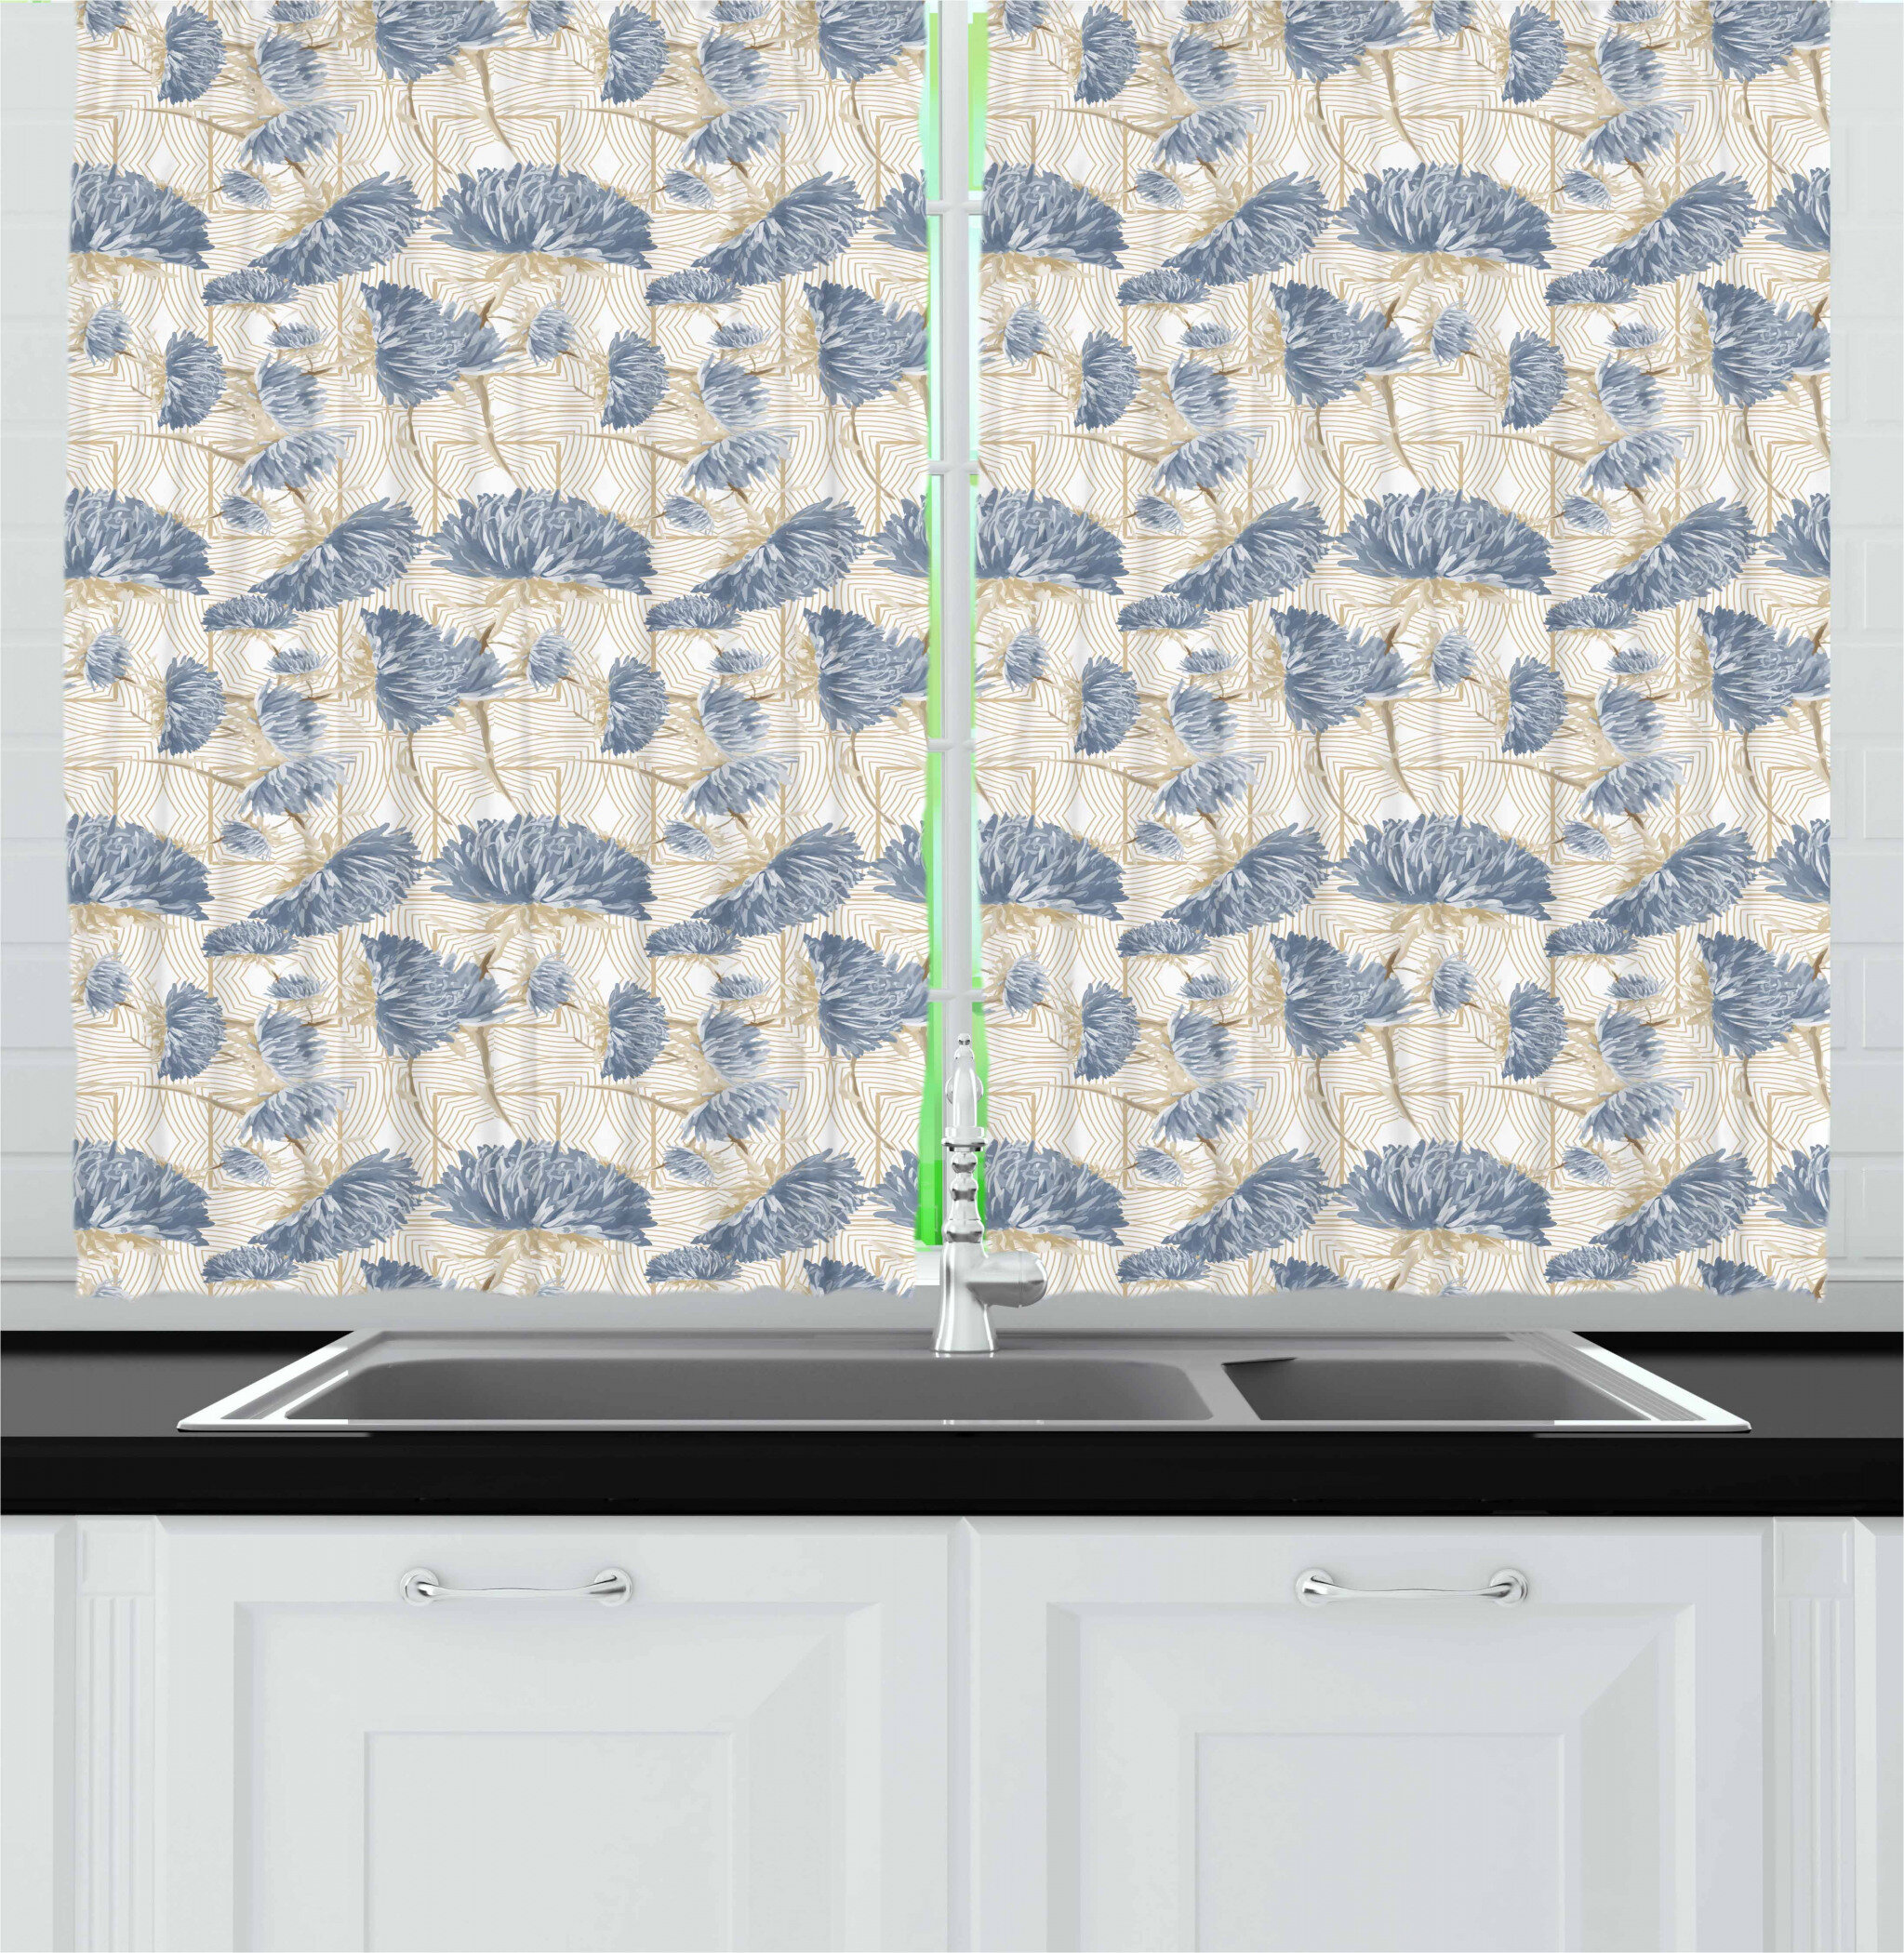 East Urban Home Aster Kitchen Curtain Wayfair